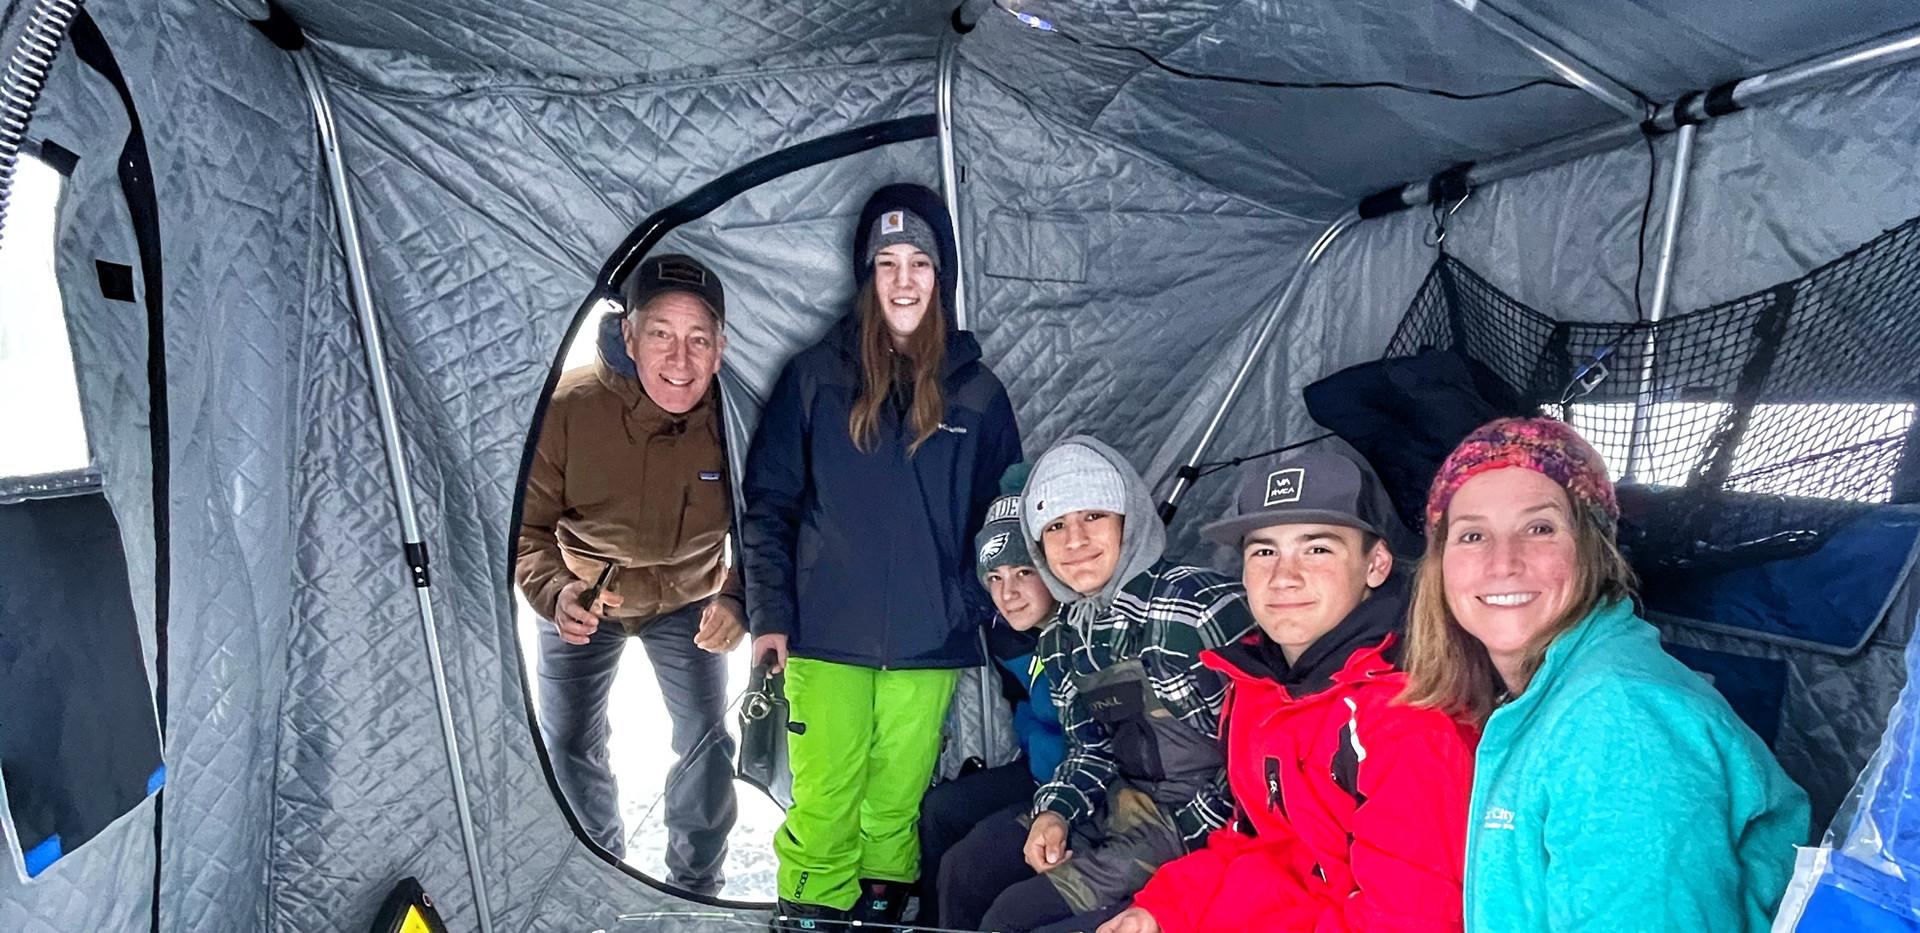 Baxstar Fishing Group Ice FIshing